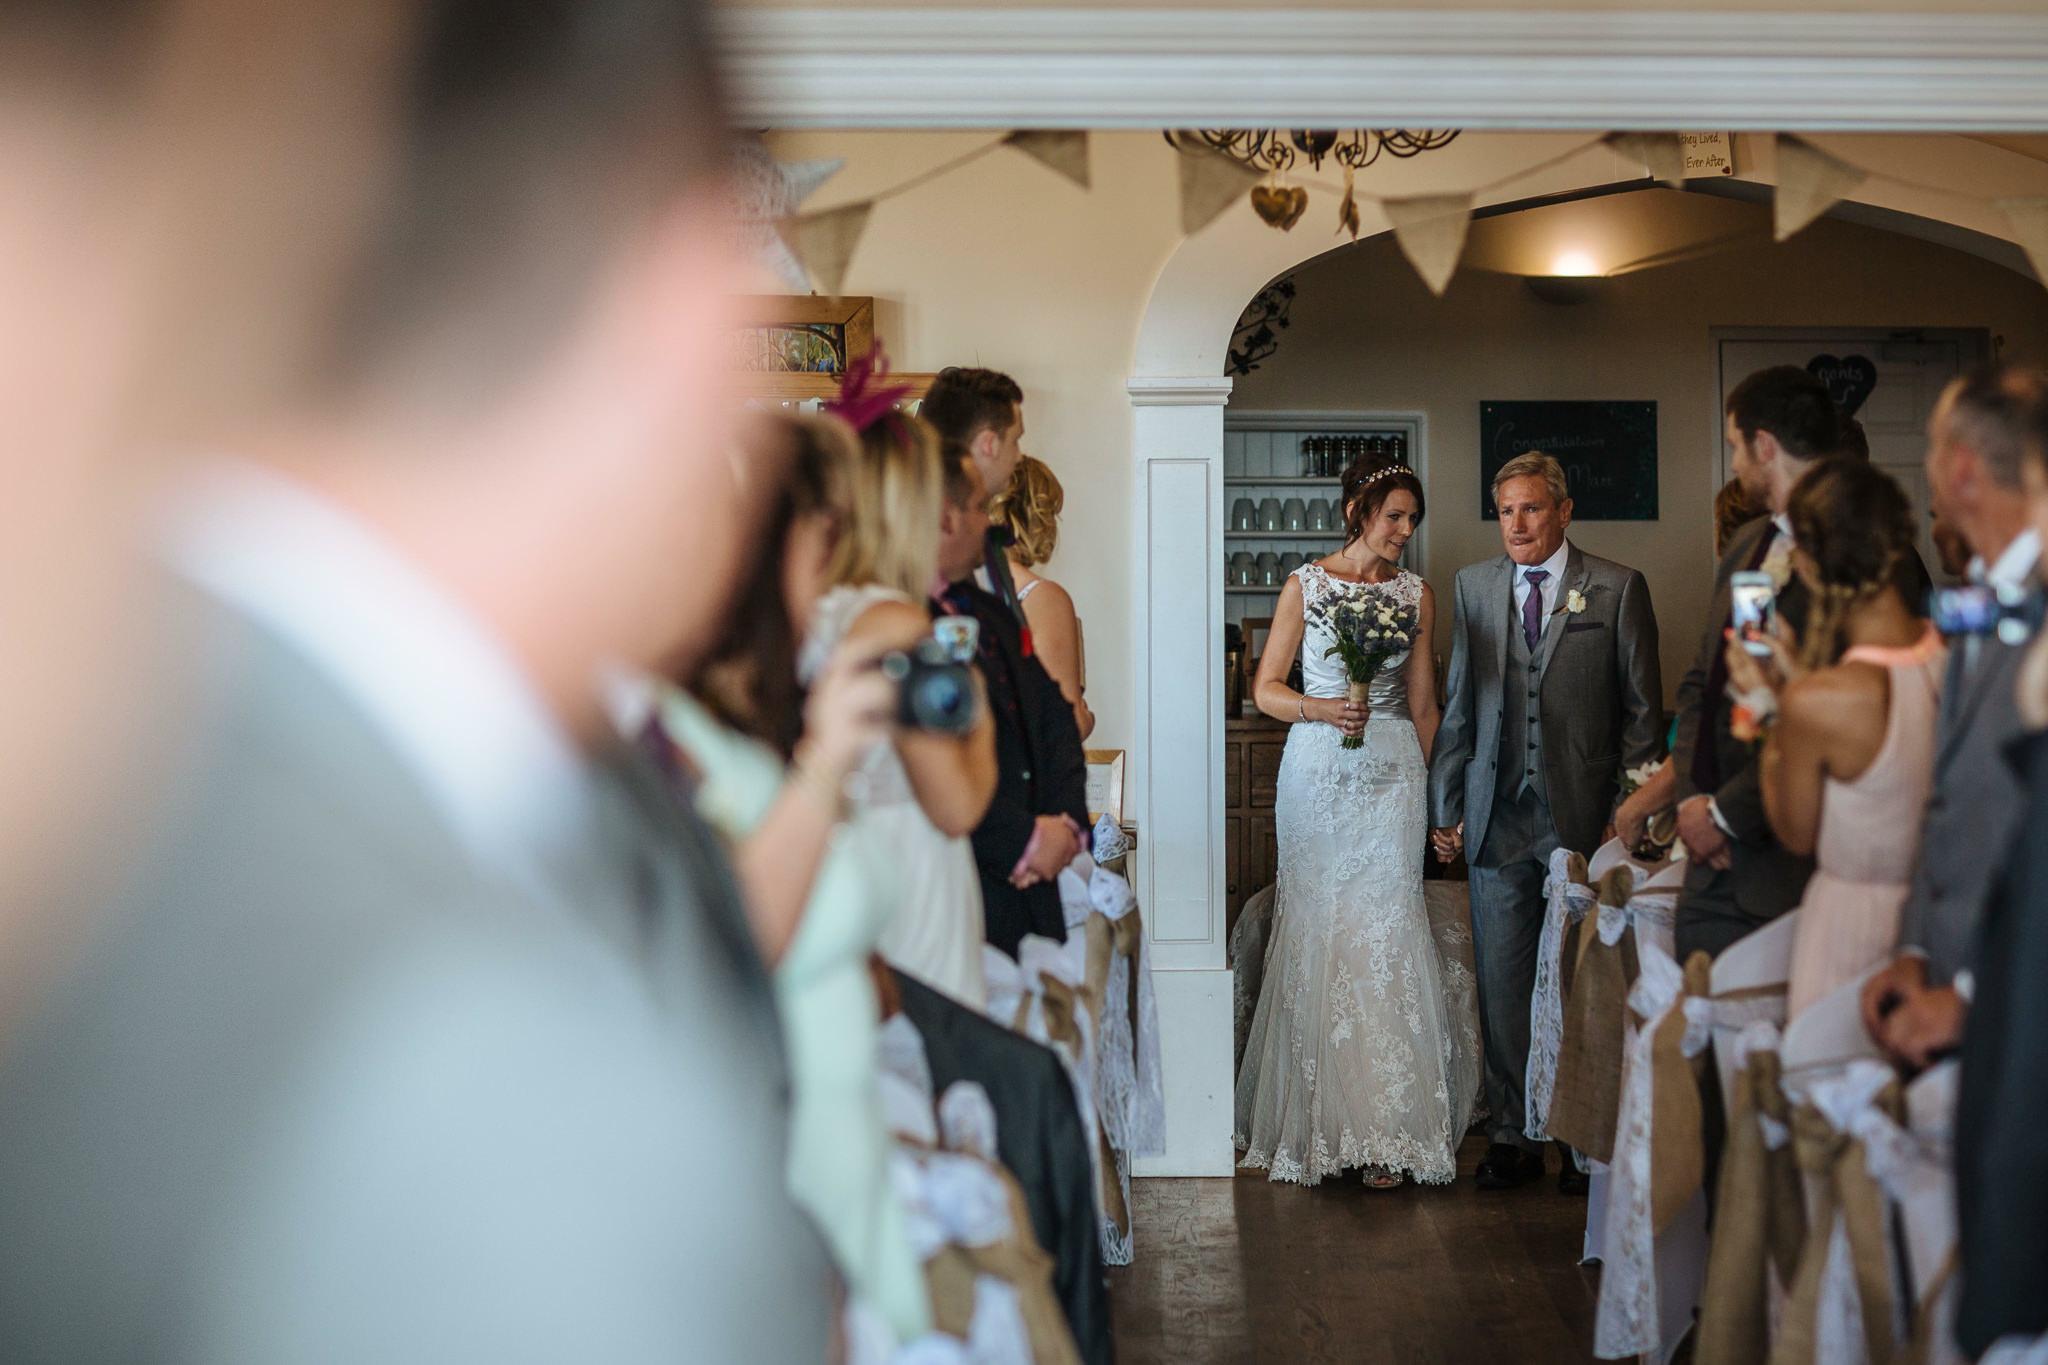 paul-marbrook-Caer-Llan-Wedding-Photographer-90037